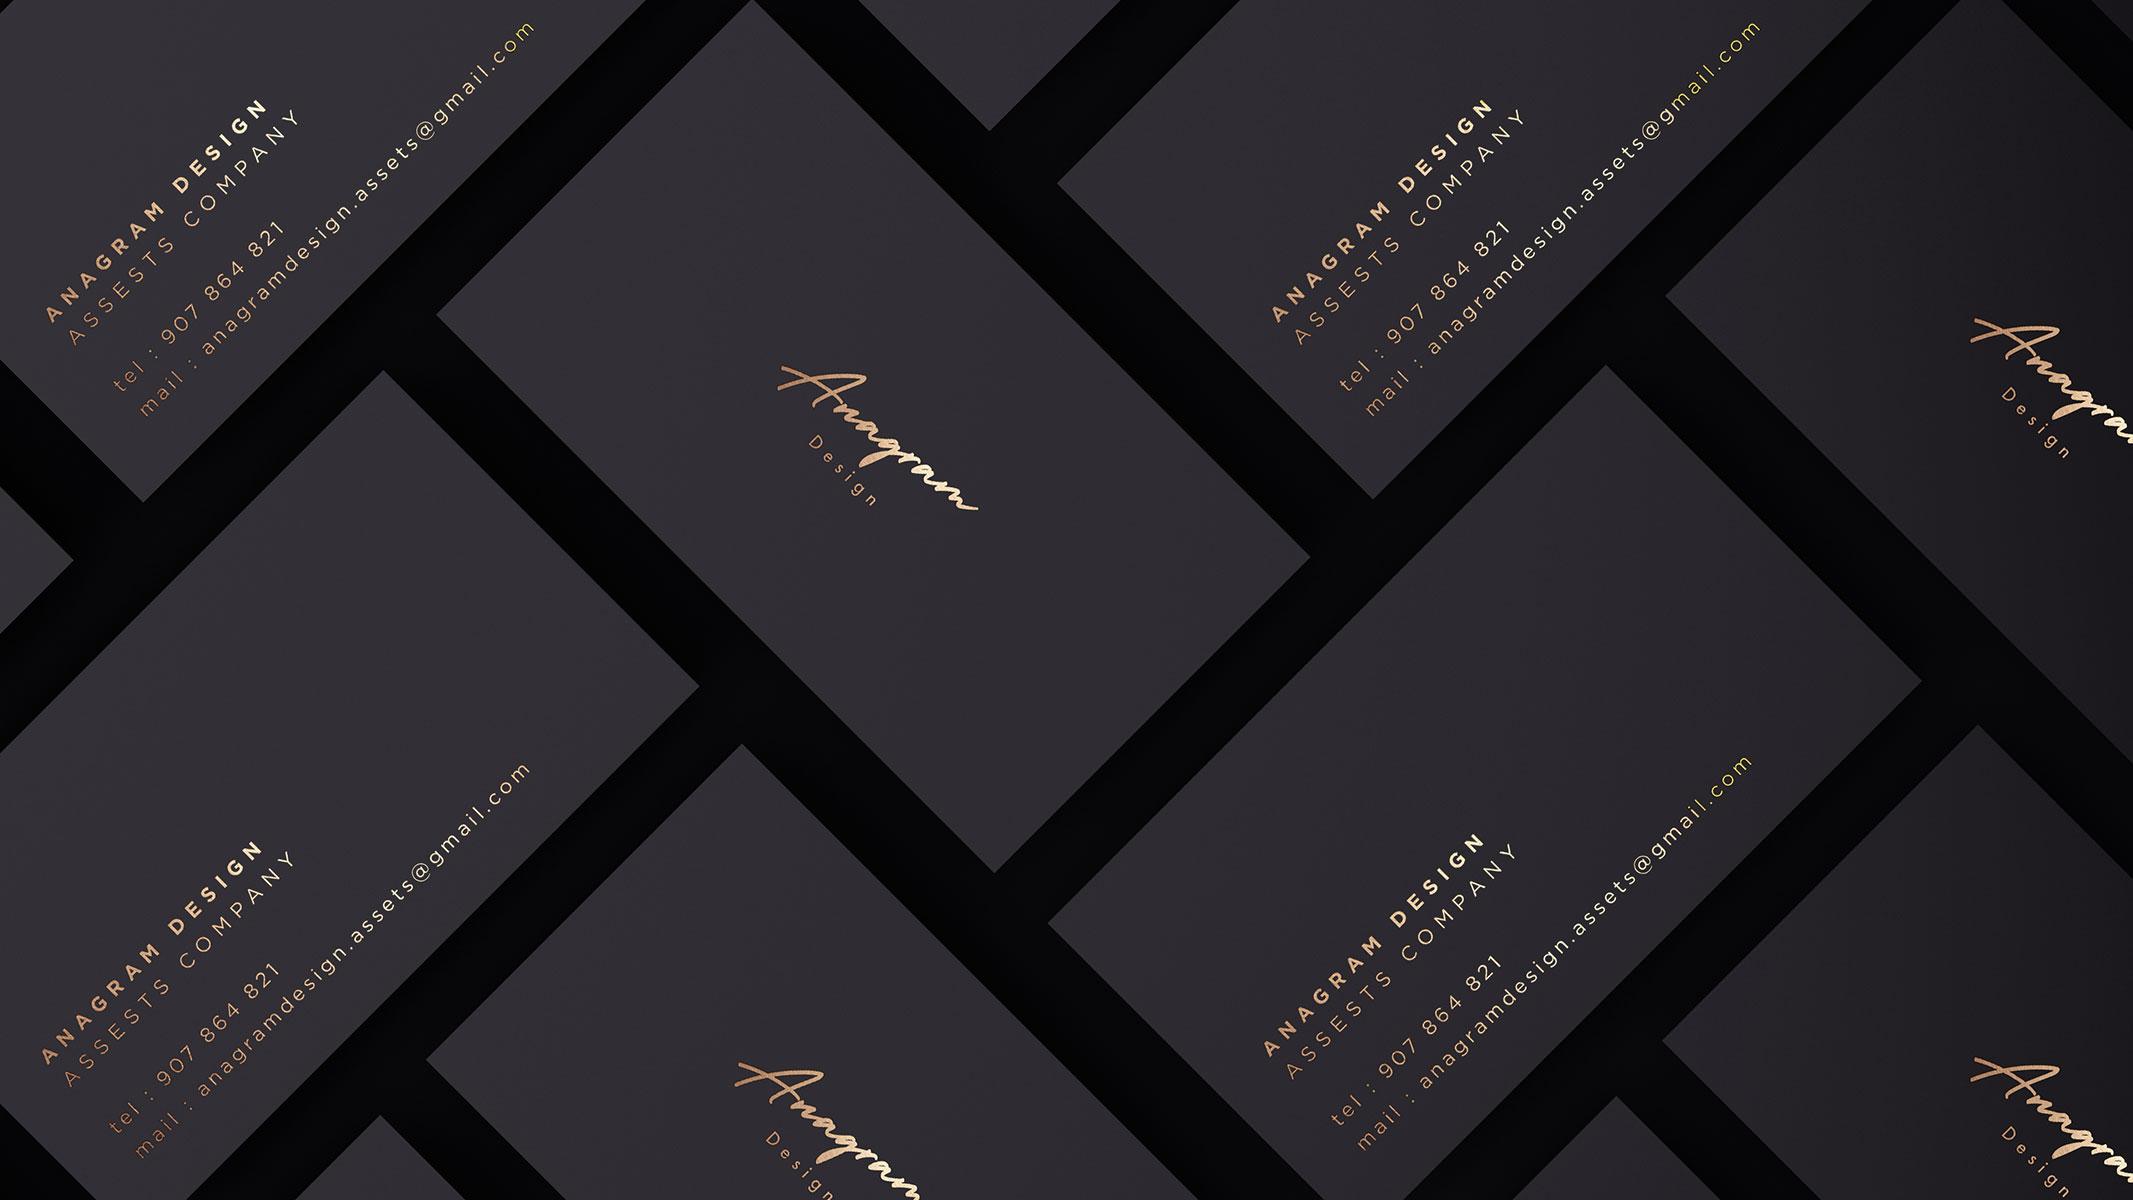 Free-Premium-Black-Business-Card-Mockup-PSD-2